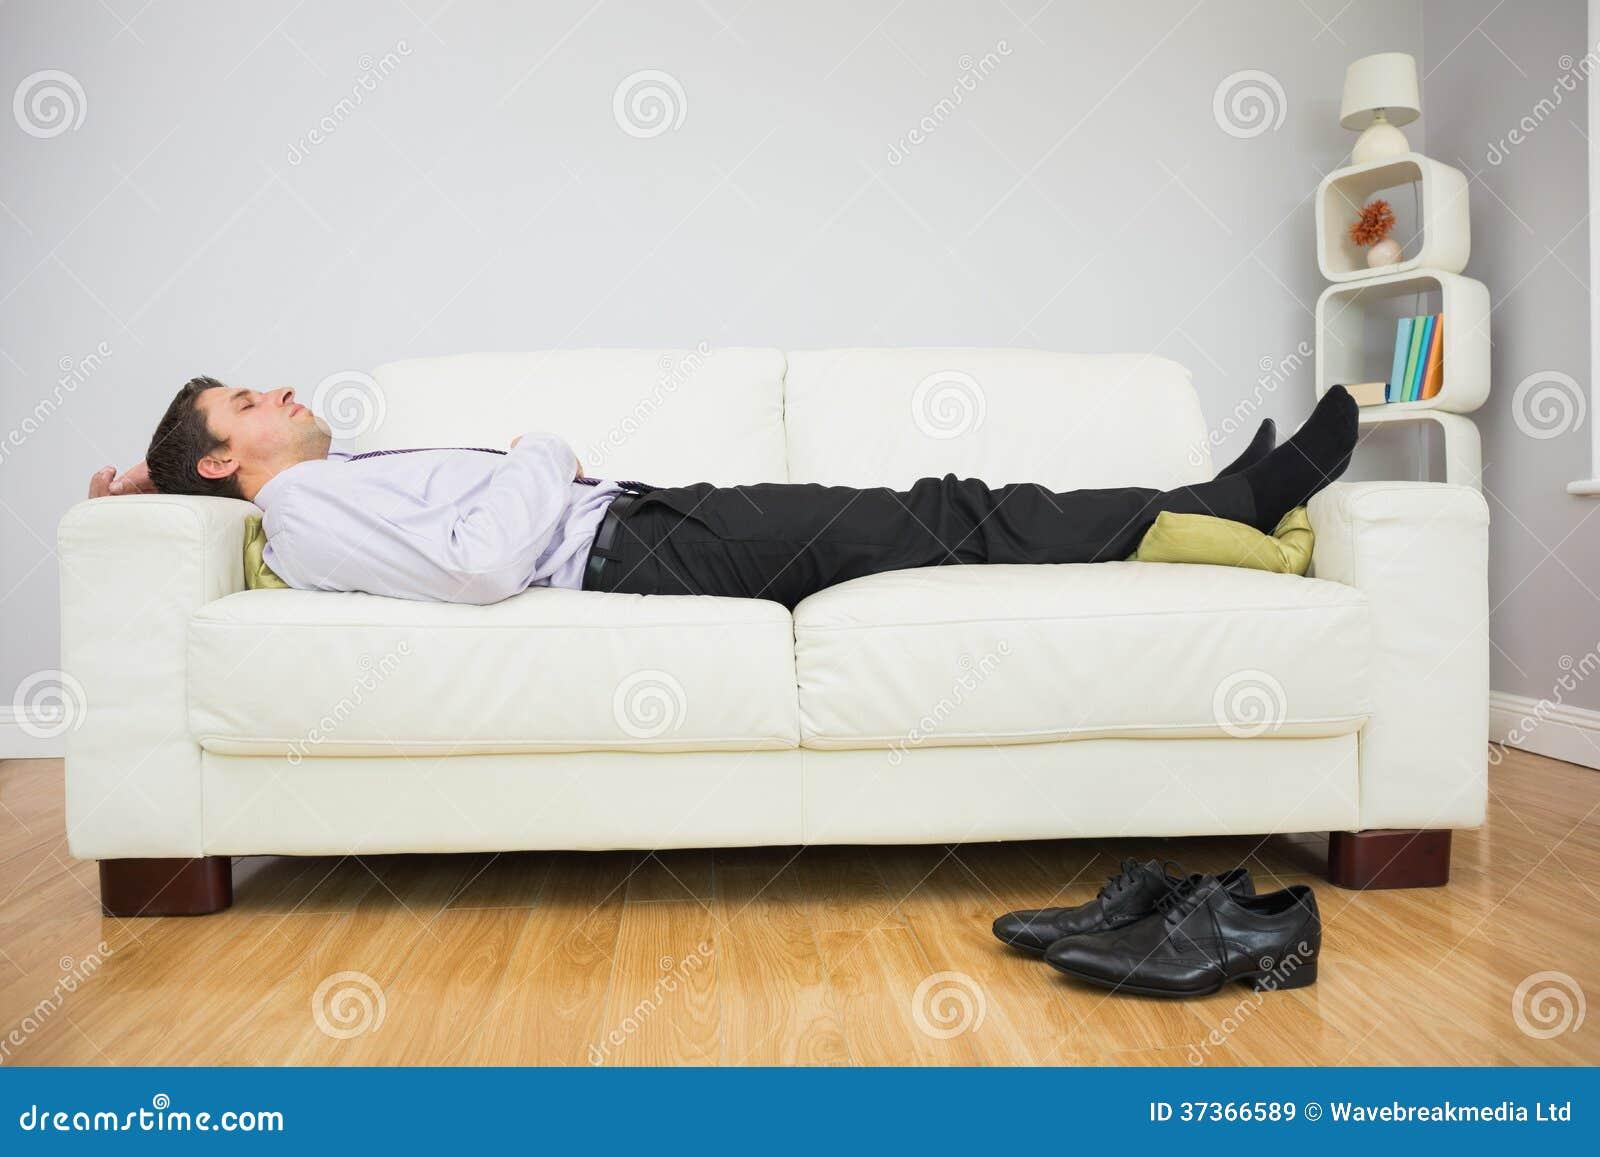 Small Sleeper Sofa Bedding Sofas Futons Ikea